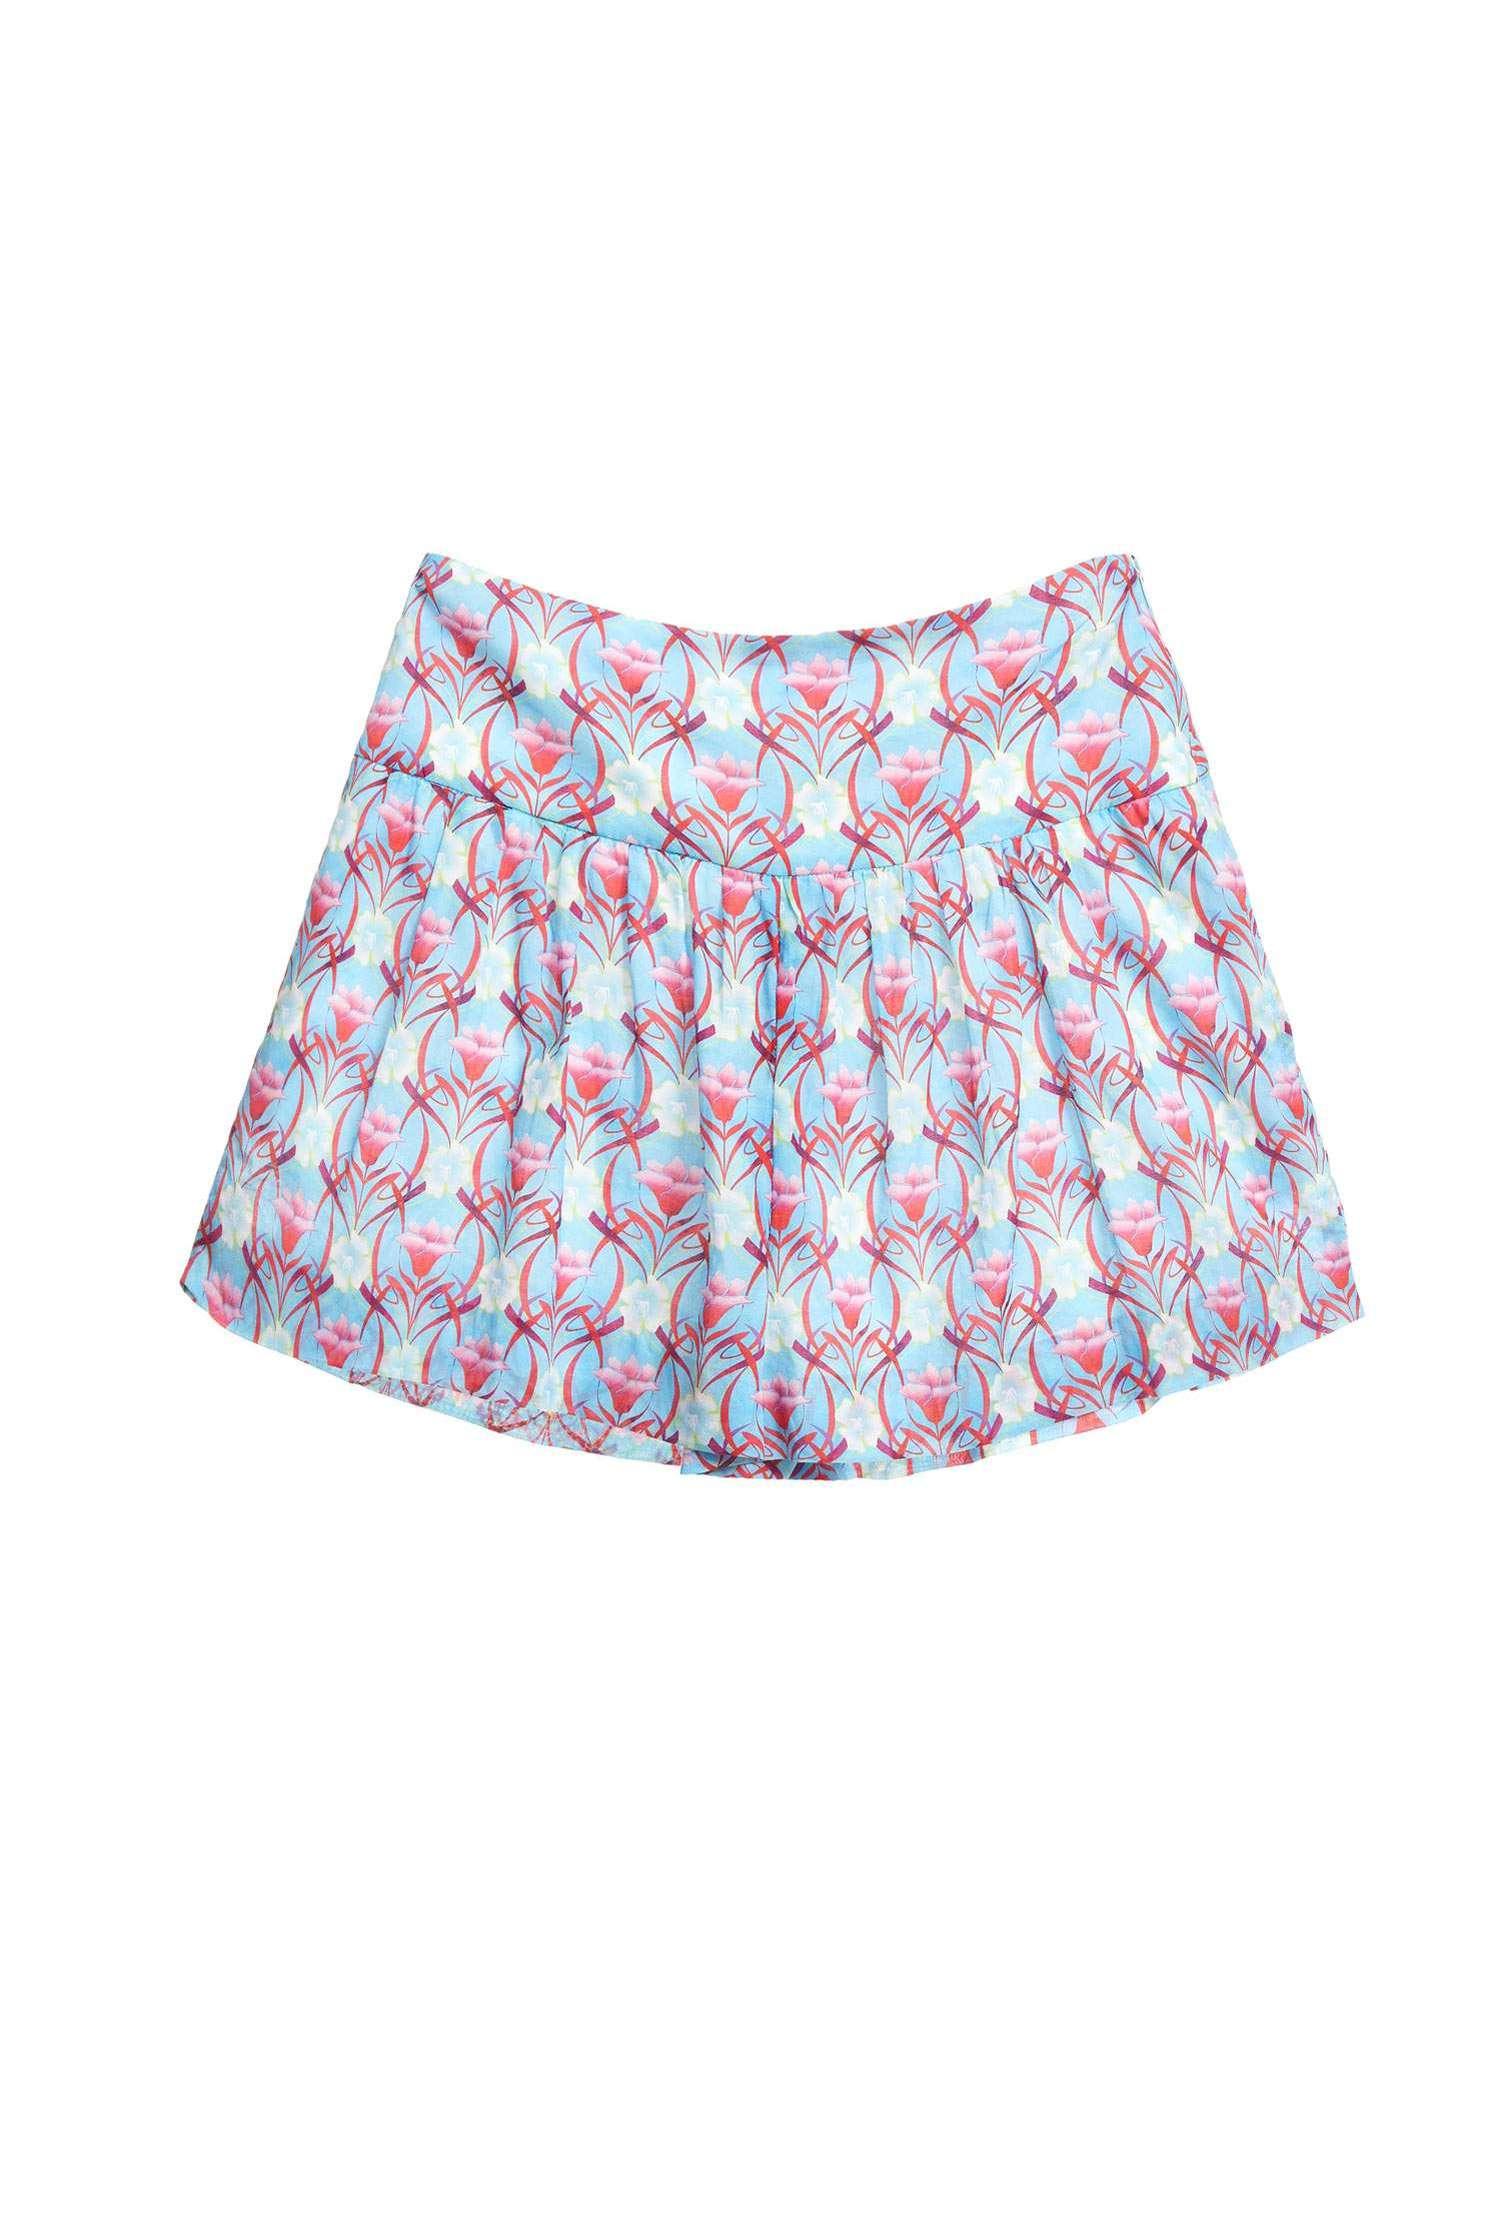 Elegant floral fashion shorts